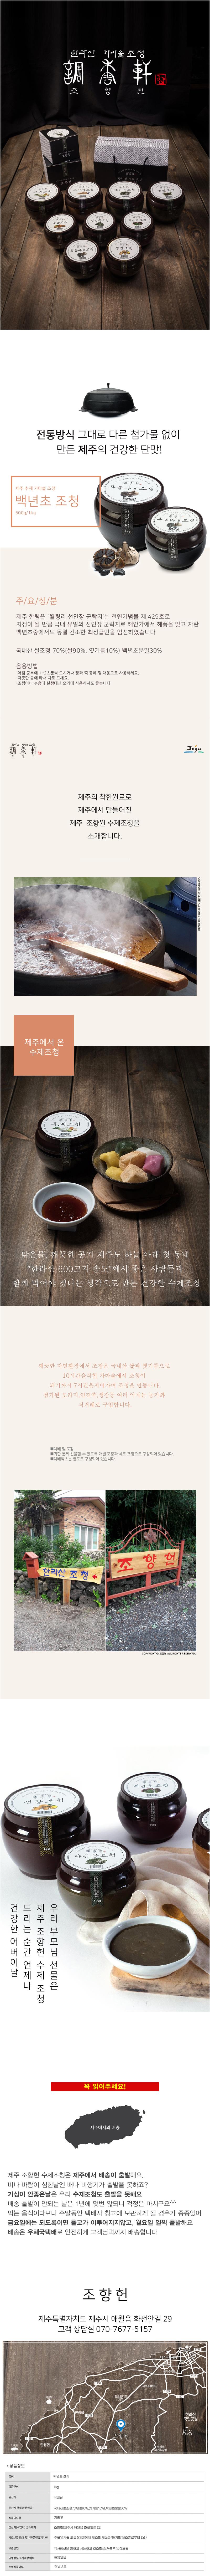 johyahuen_page_baegnyencho_1kg.jpg